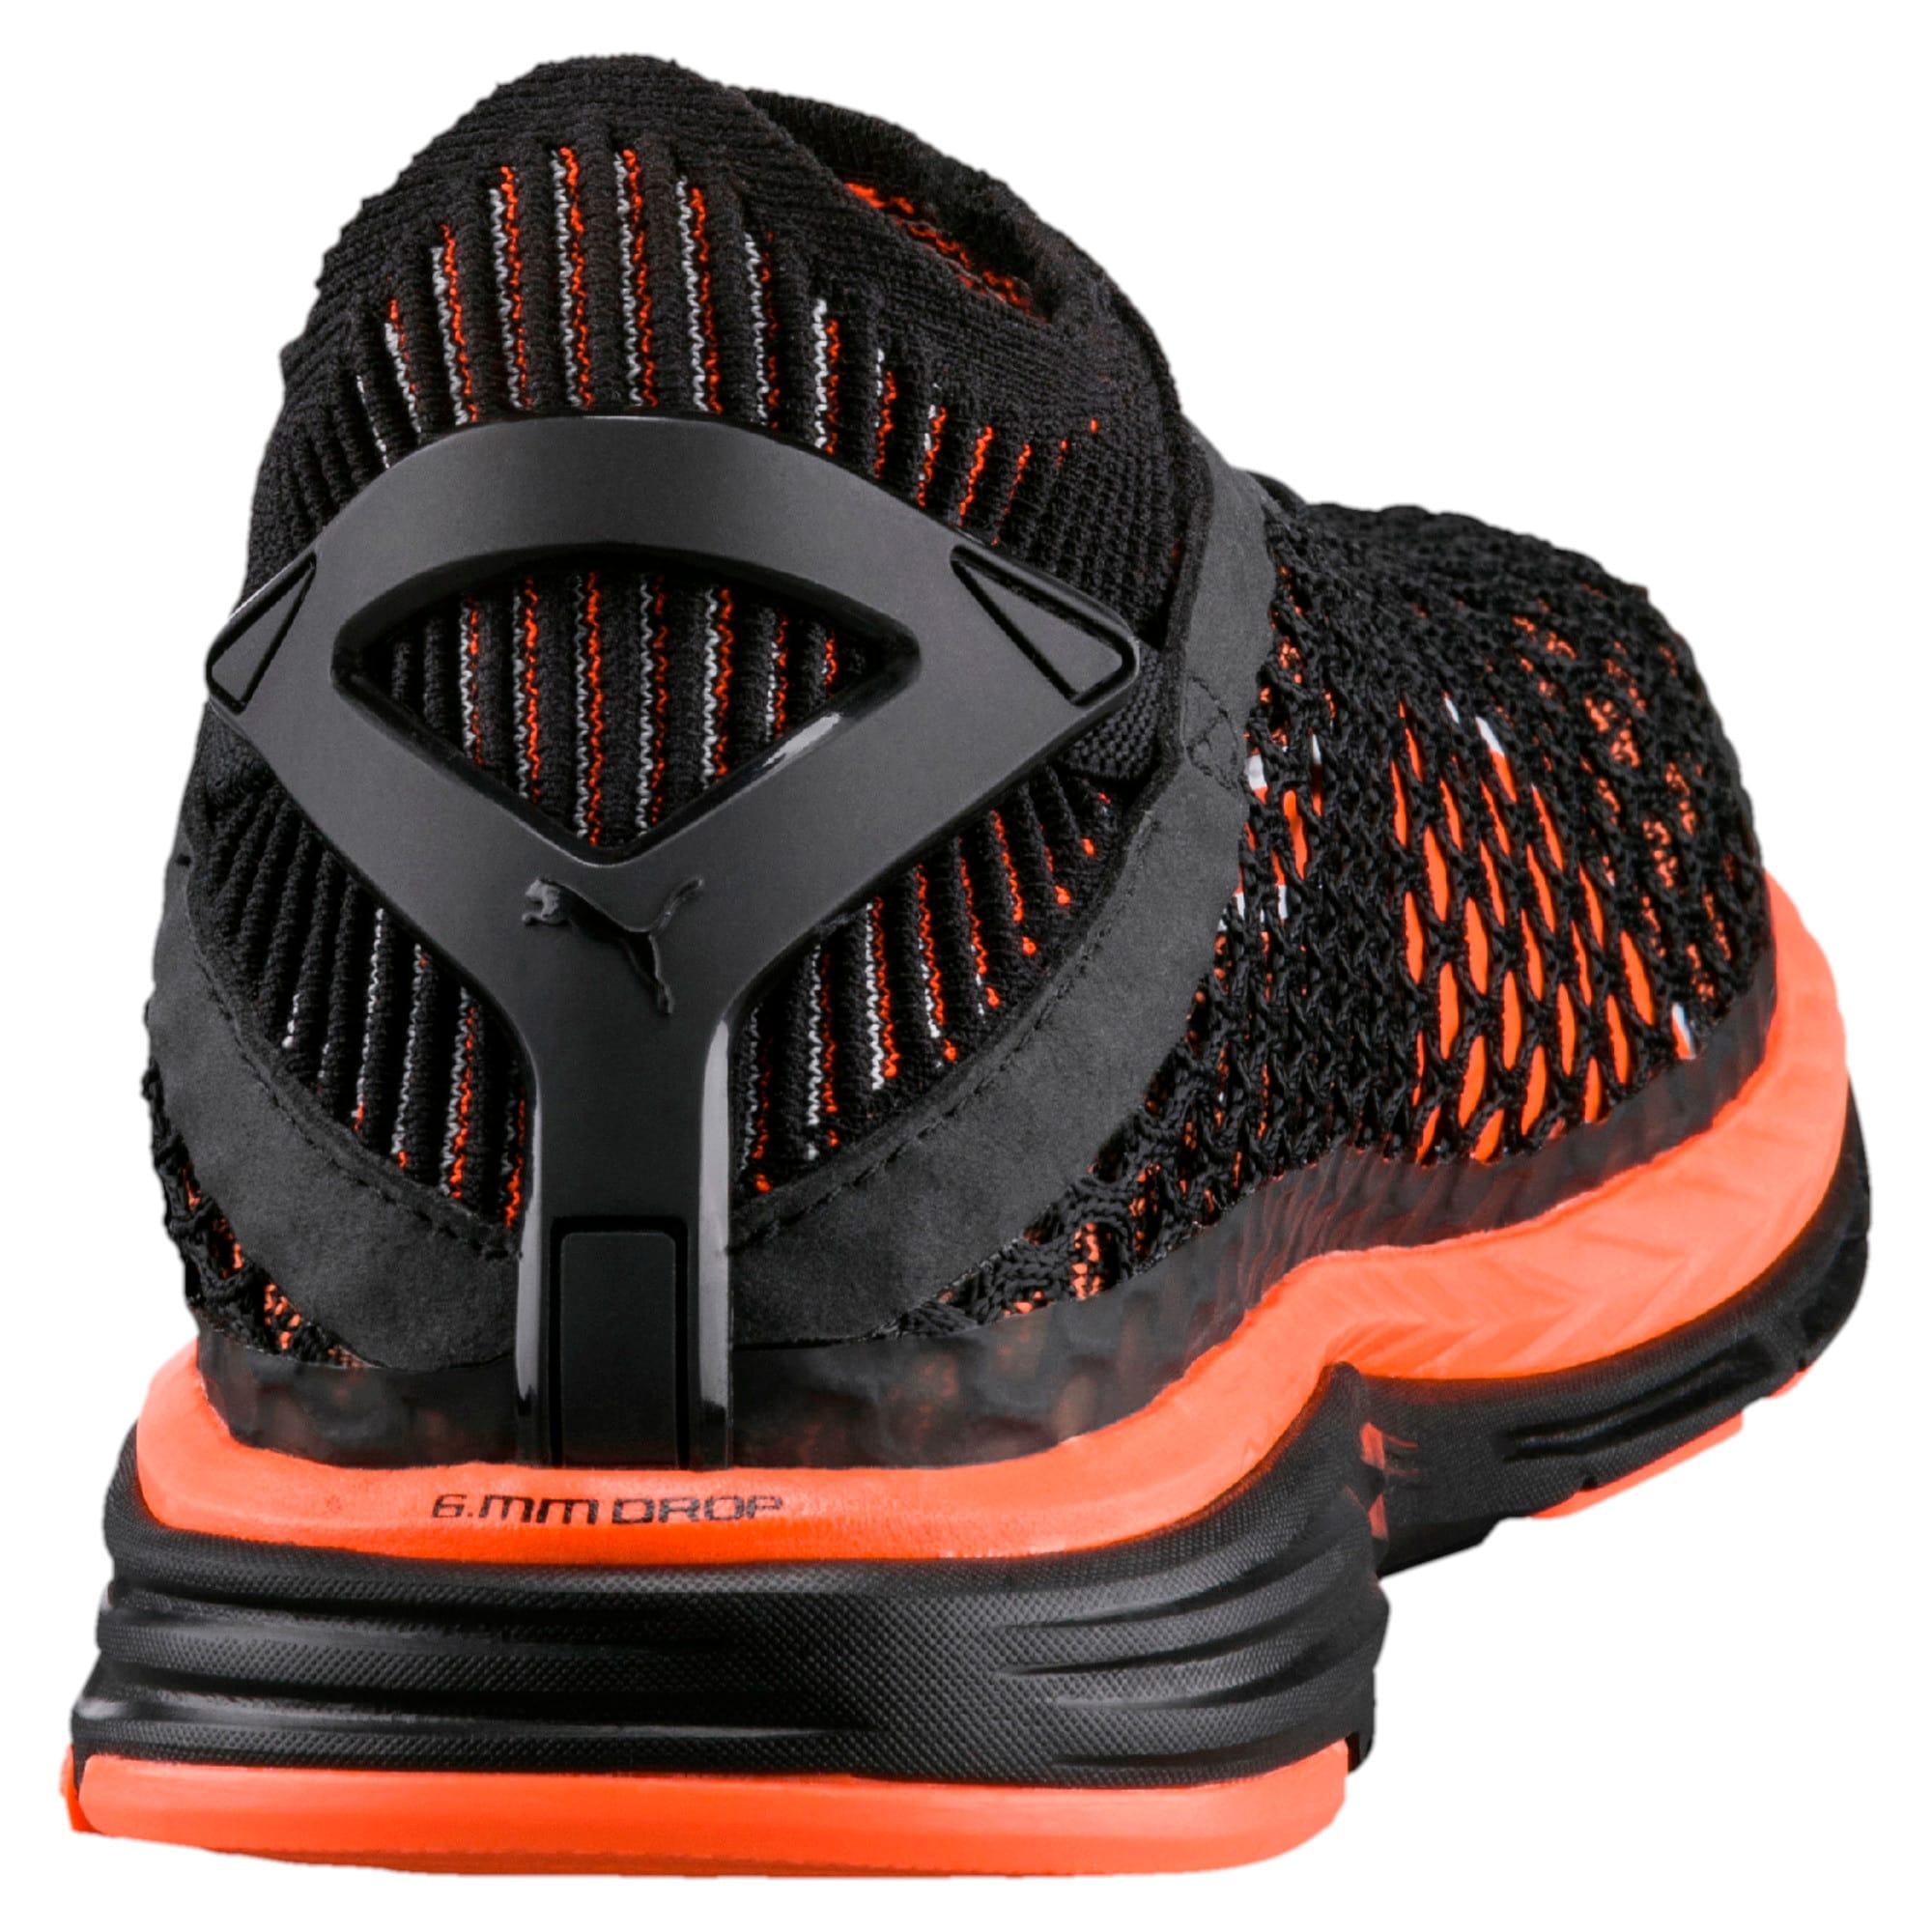 Thumbnail 4 of Speed IGNITE NETFIT Men's Running Shoes, Black-Shocking Orange-White, medium-IND